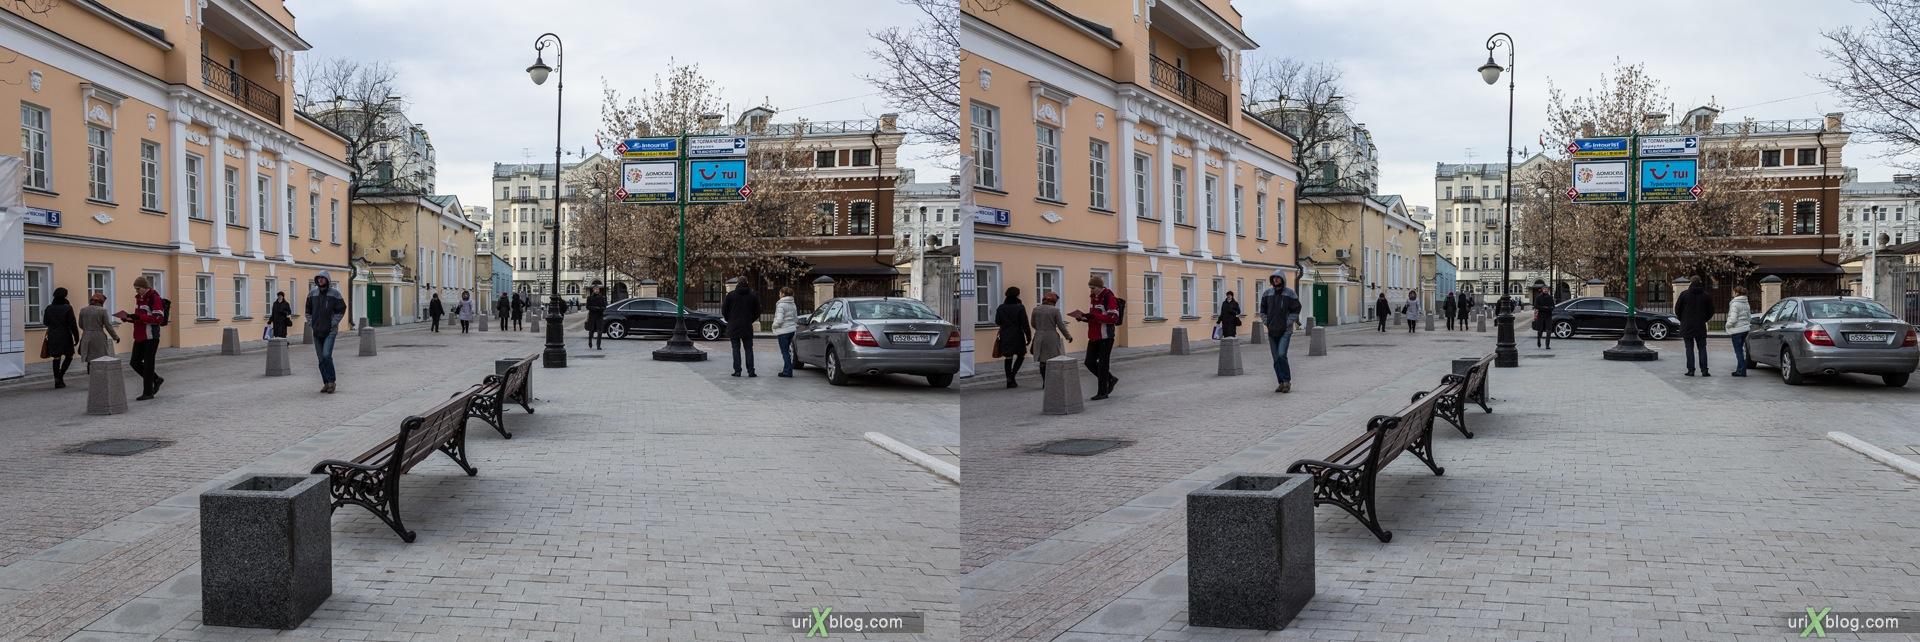 2013, Moscow, Russia, Bolshoy Tolmachovsky alley, metro, street, new pedestrian zone, 3D, stereo pair, cross-eyed, crossview, cross view stereo pair, stereoscopic